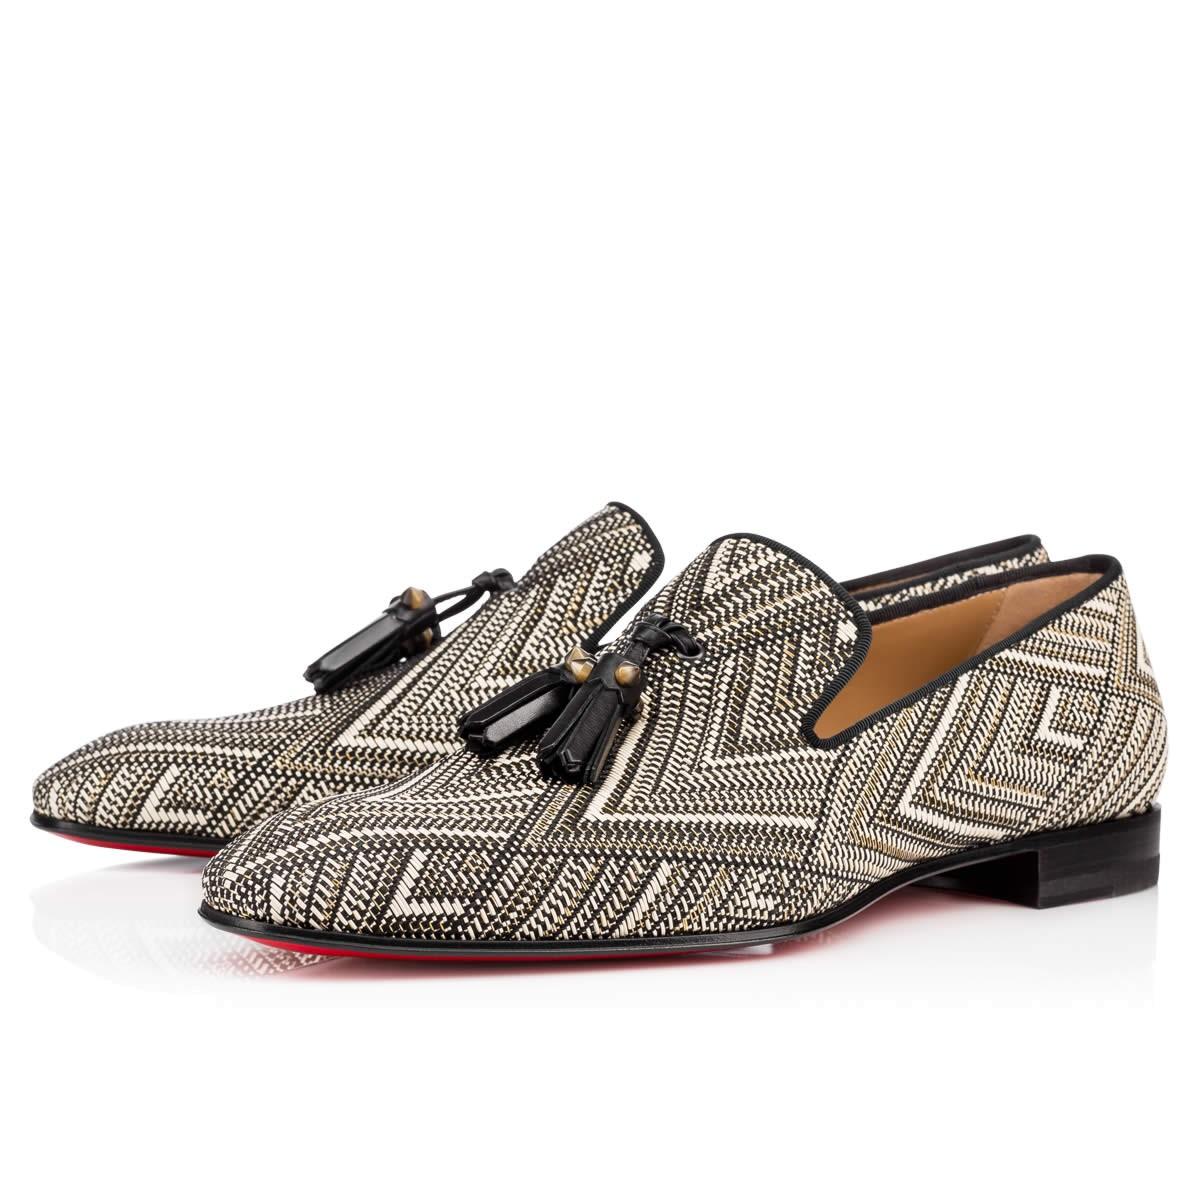 cc61cb30e16 Dandelion Tassel Flat Black-White/Corne 2 Rafia - Men Shoes - Christian  Louboutin in Black/White